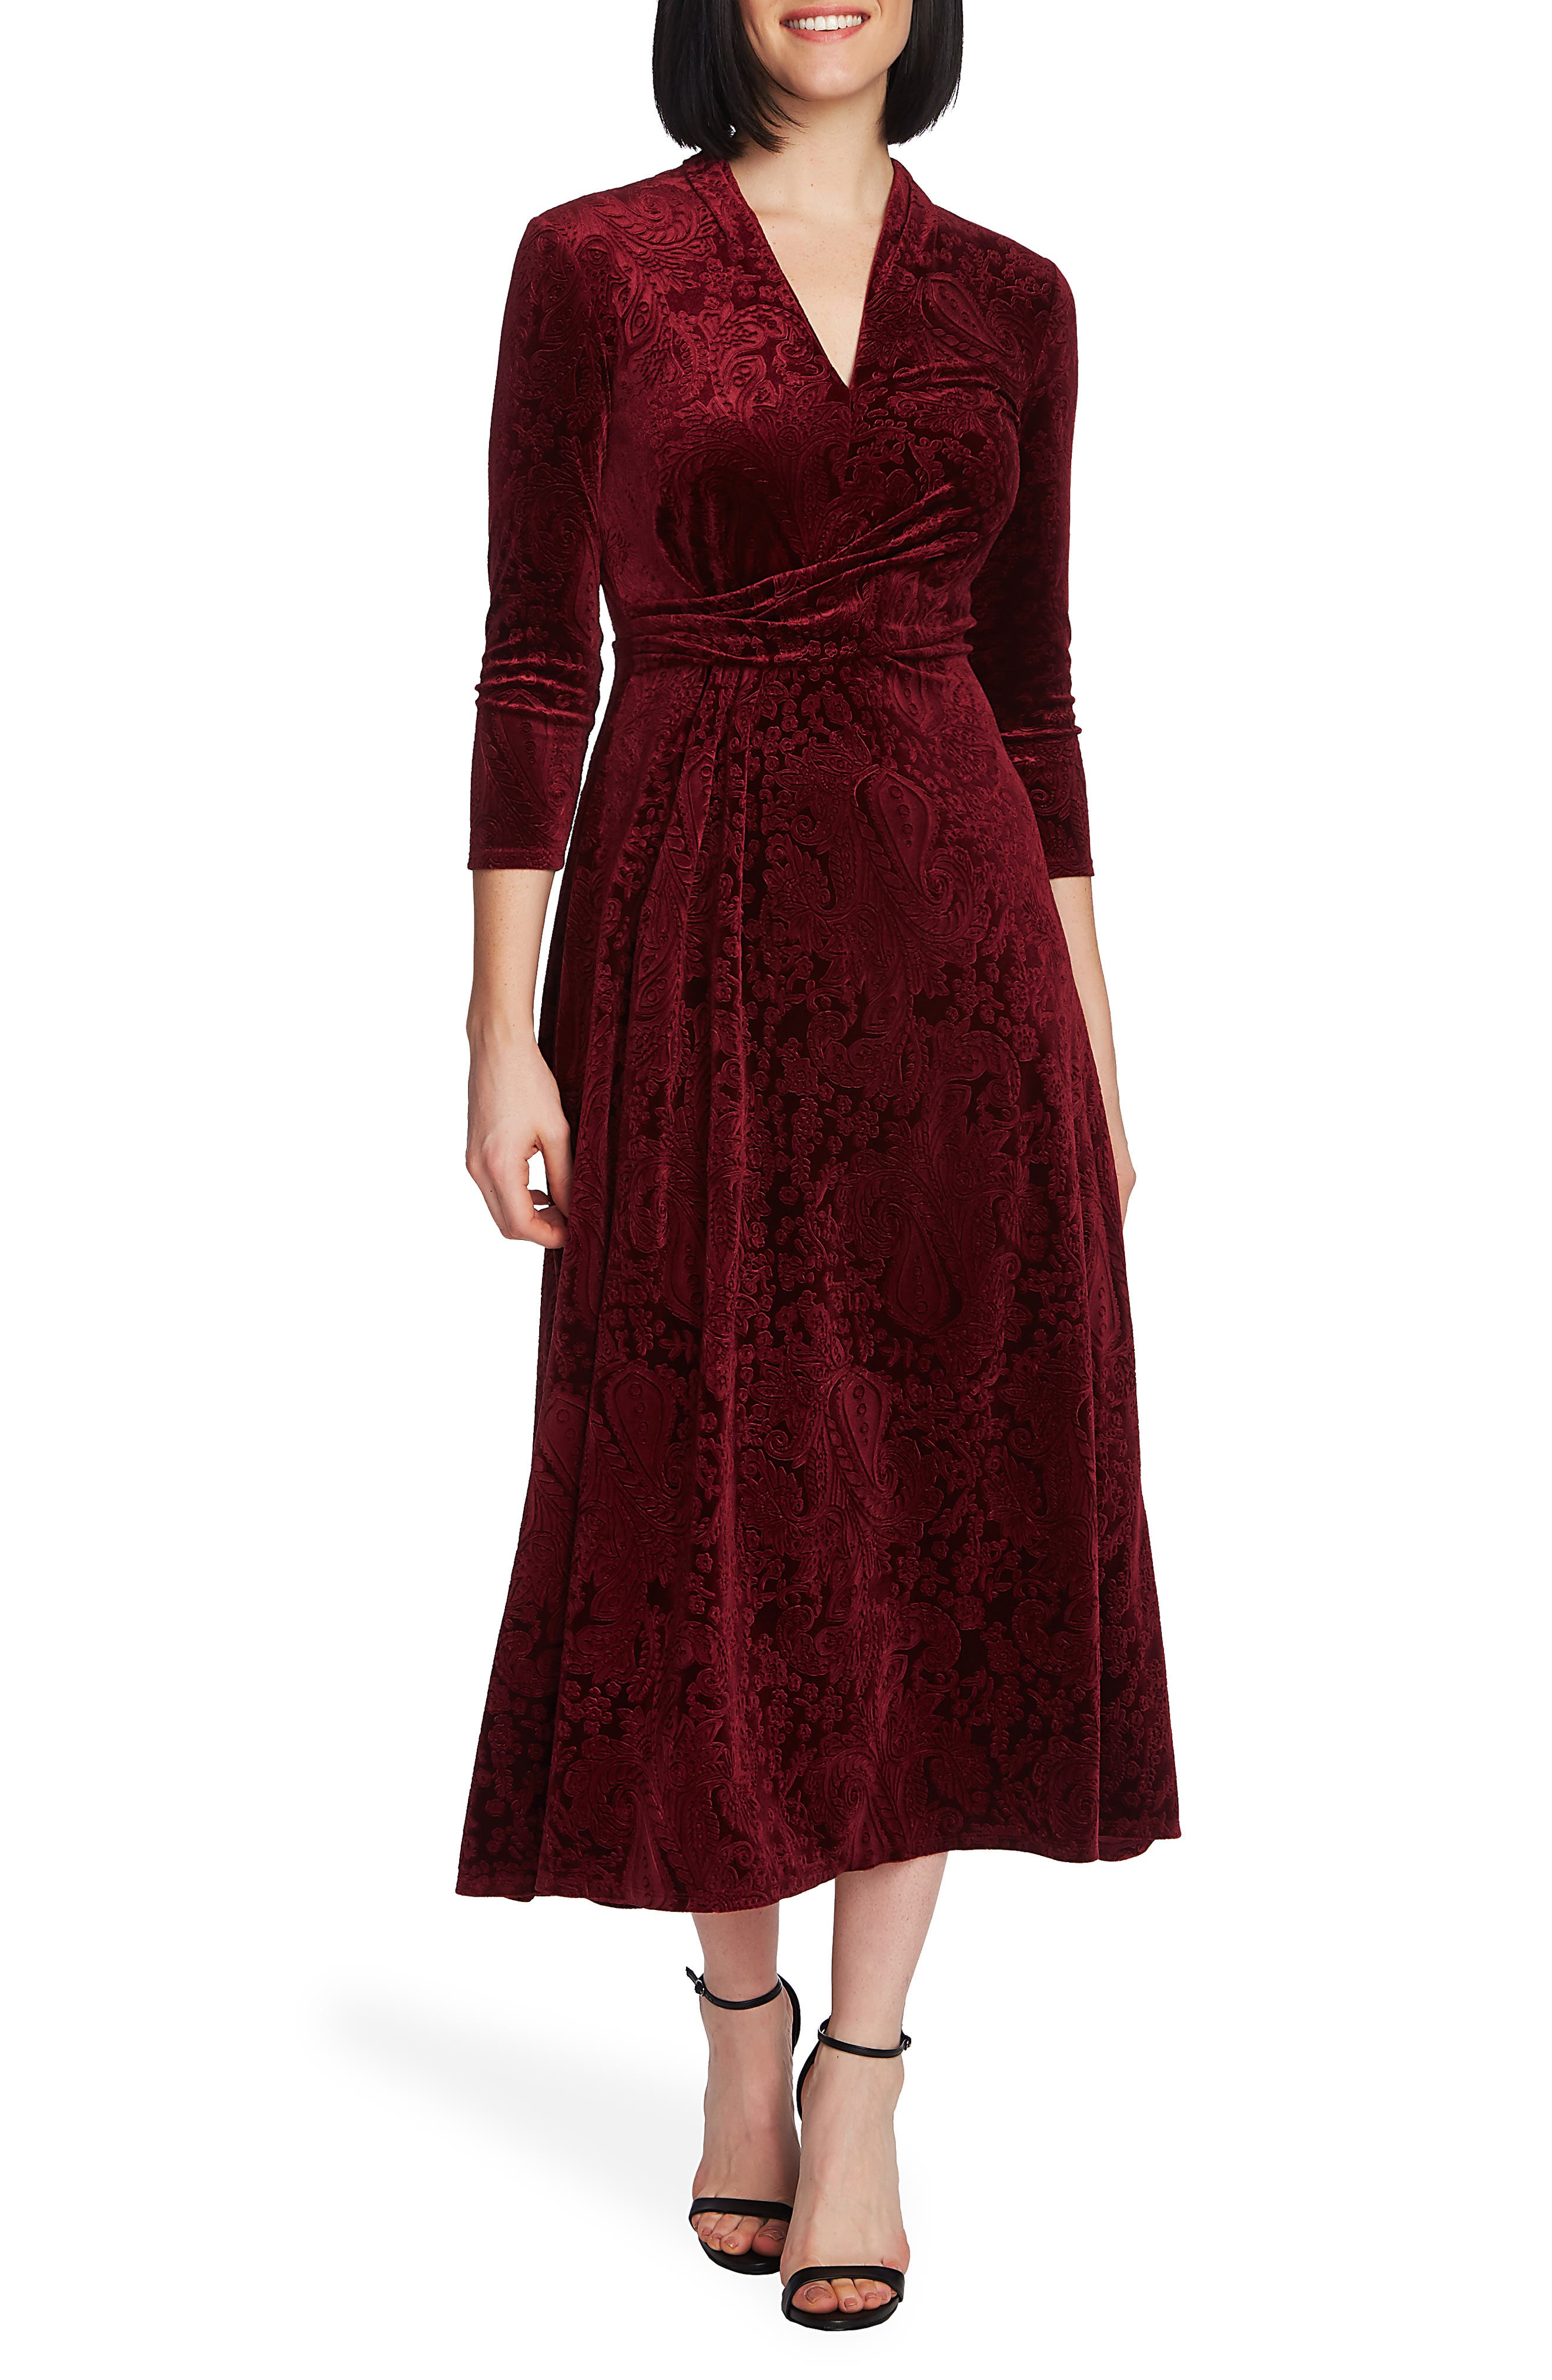 Vintage 1920s Dresses – Where to Buy Womens Chaus Paisley Velvet Midi Dress $99.00 AT vintagedancer.com